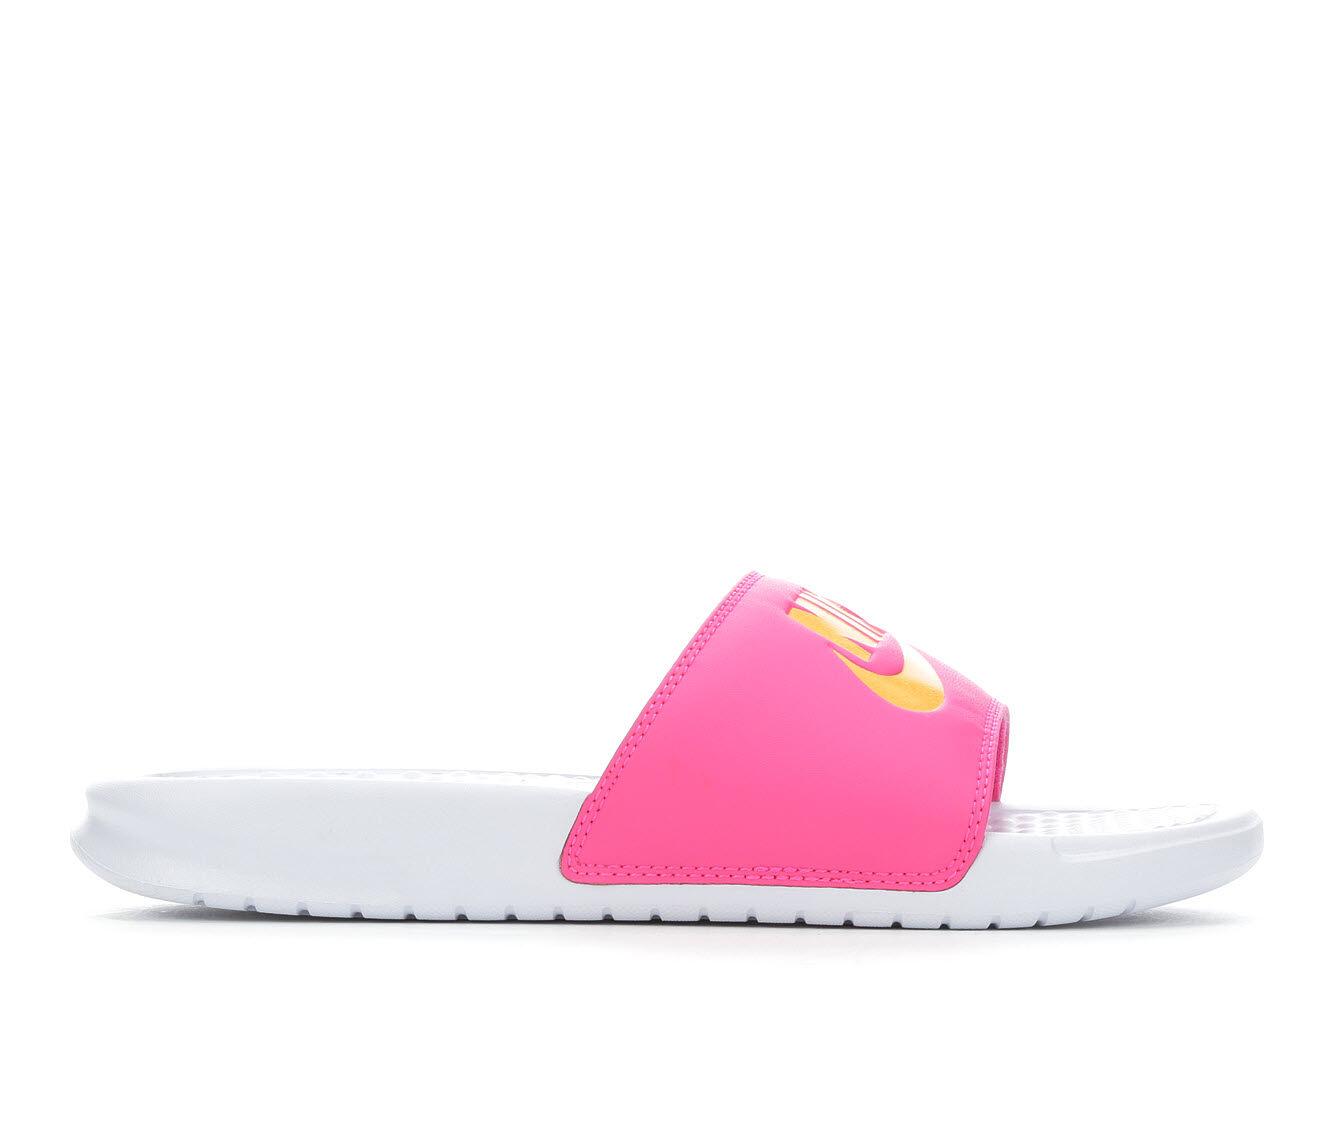 Women's Nike Benassi JDI Slide Sandals Whi/Fuschsia/Or